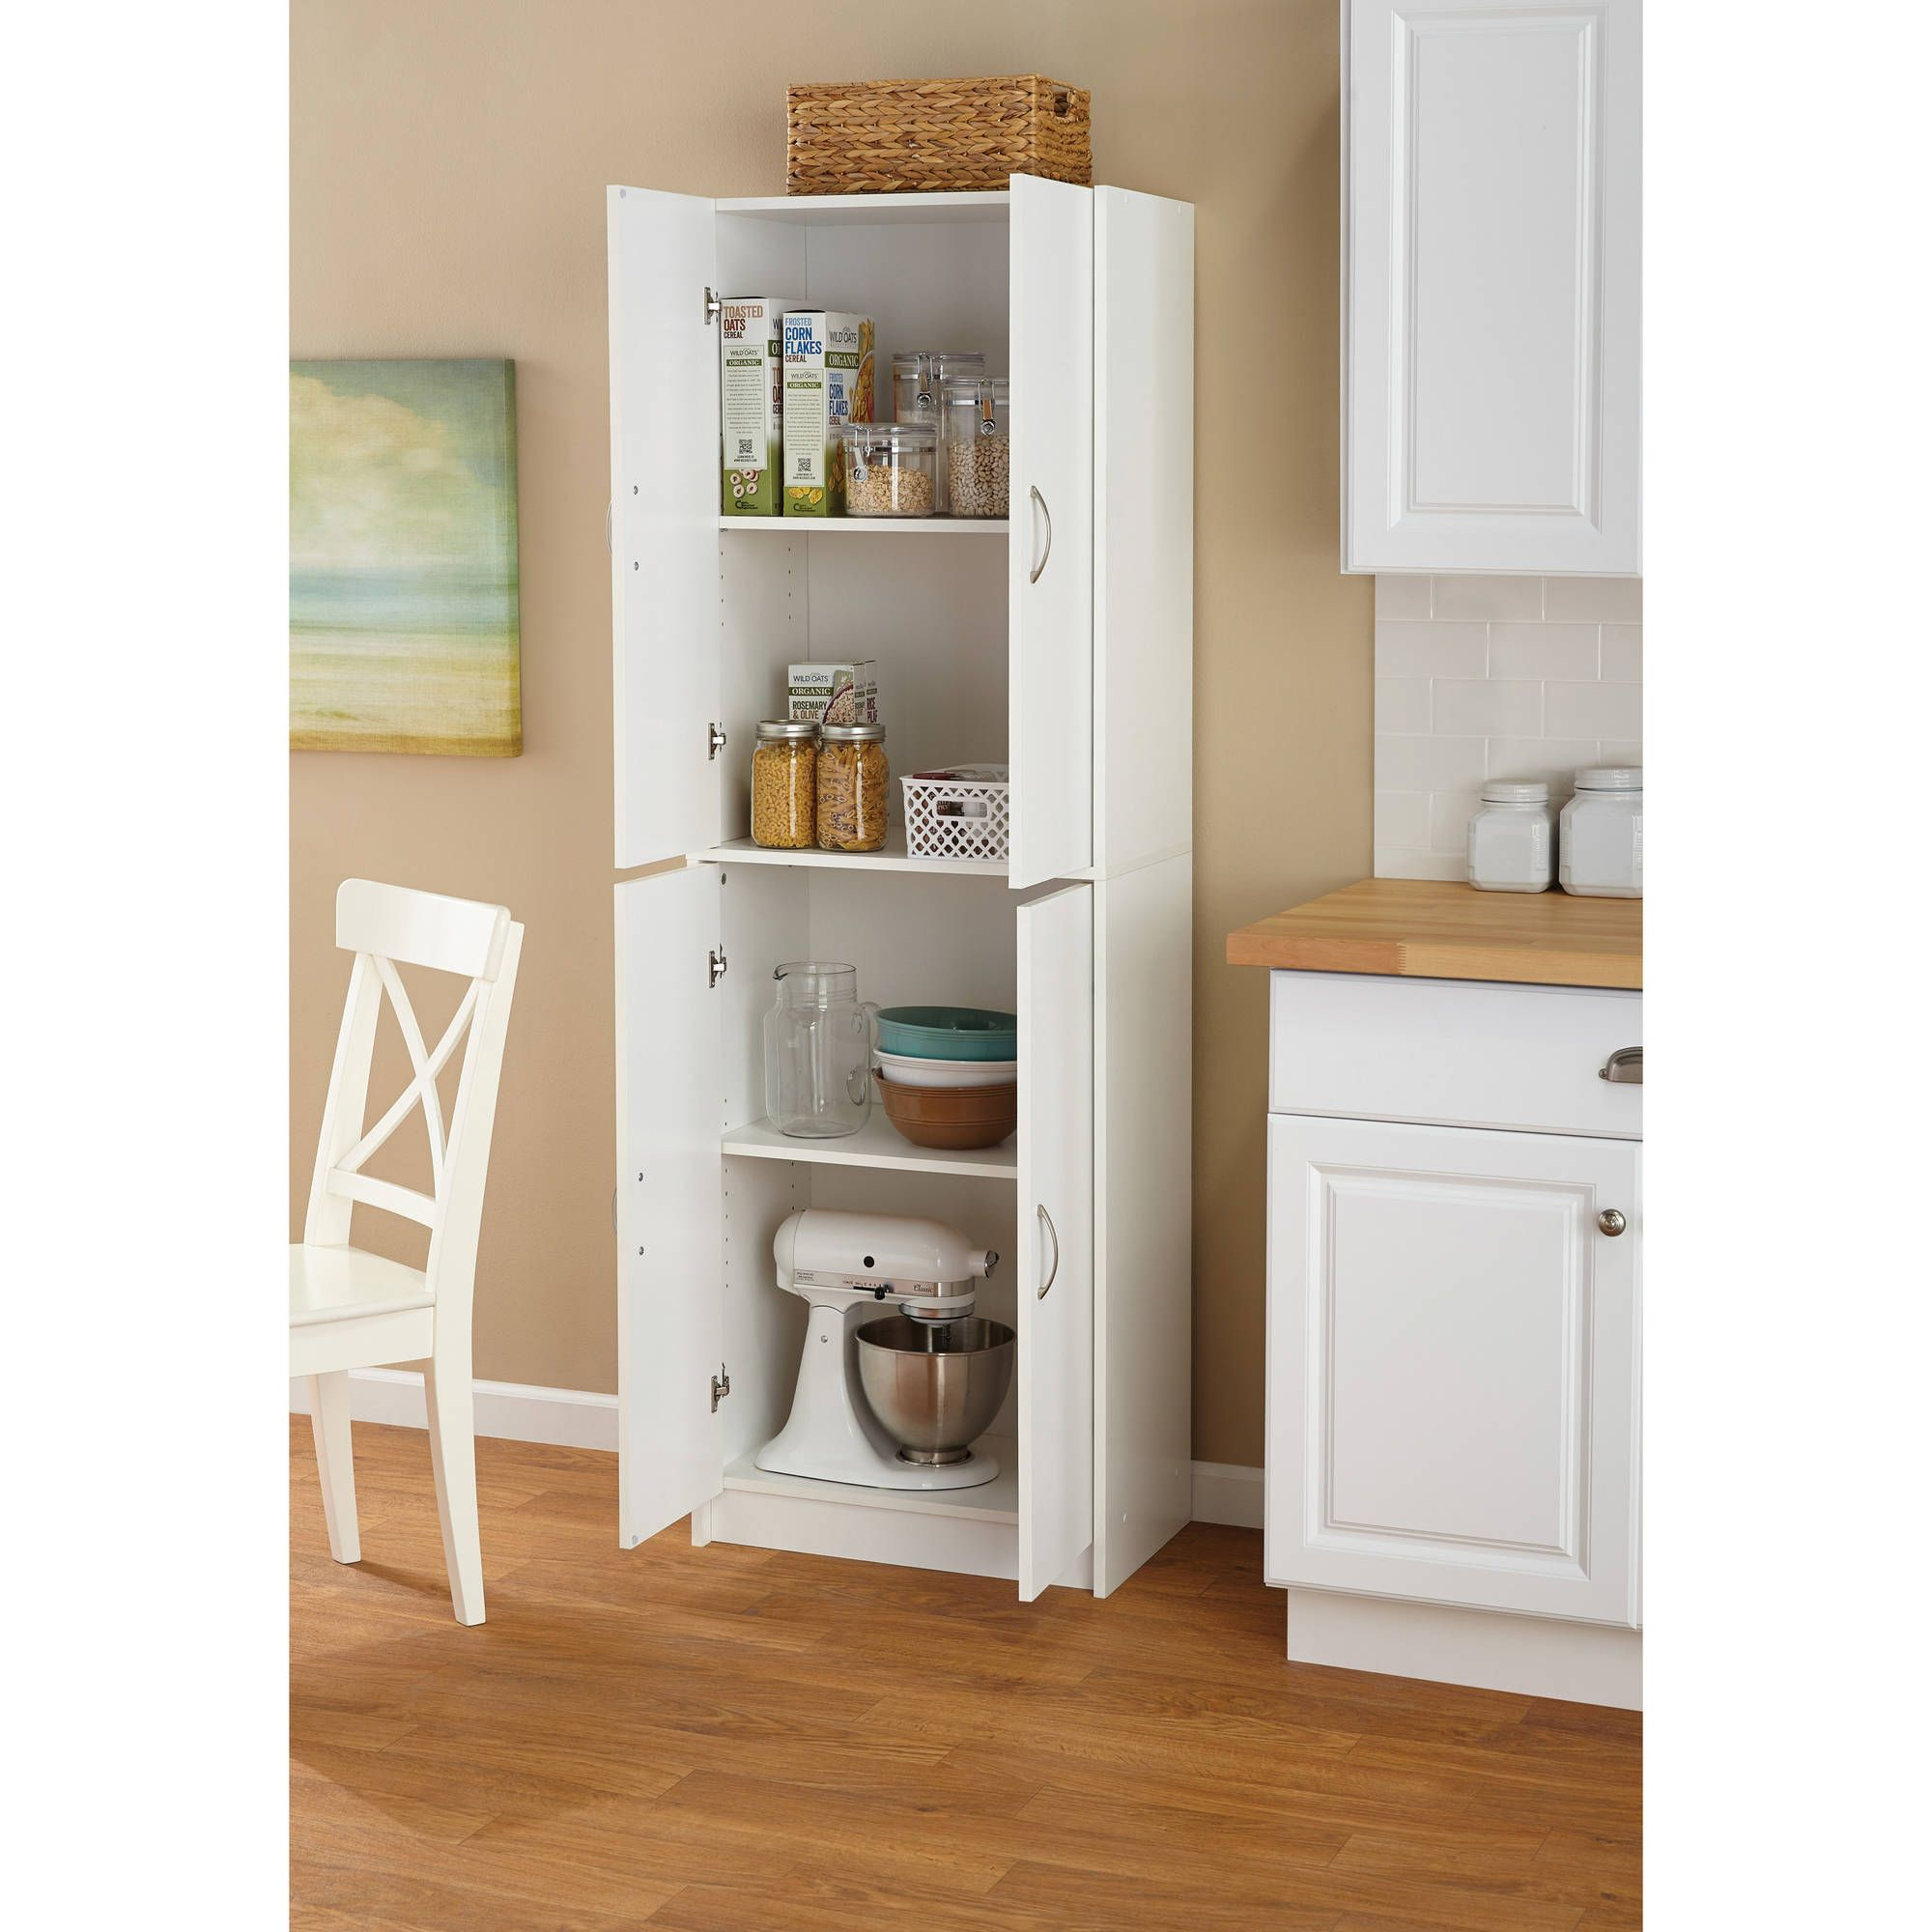 Mainstays 4 Shelf Multipurpose Storage Cabinet White Walmart Com In 2020 White Storage Cabinets Kitchen Cabinet Storage White Kitchen Storage Cabinet